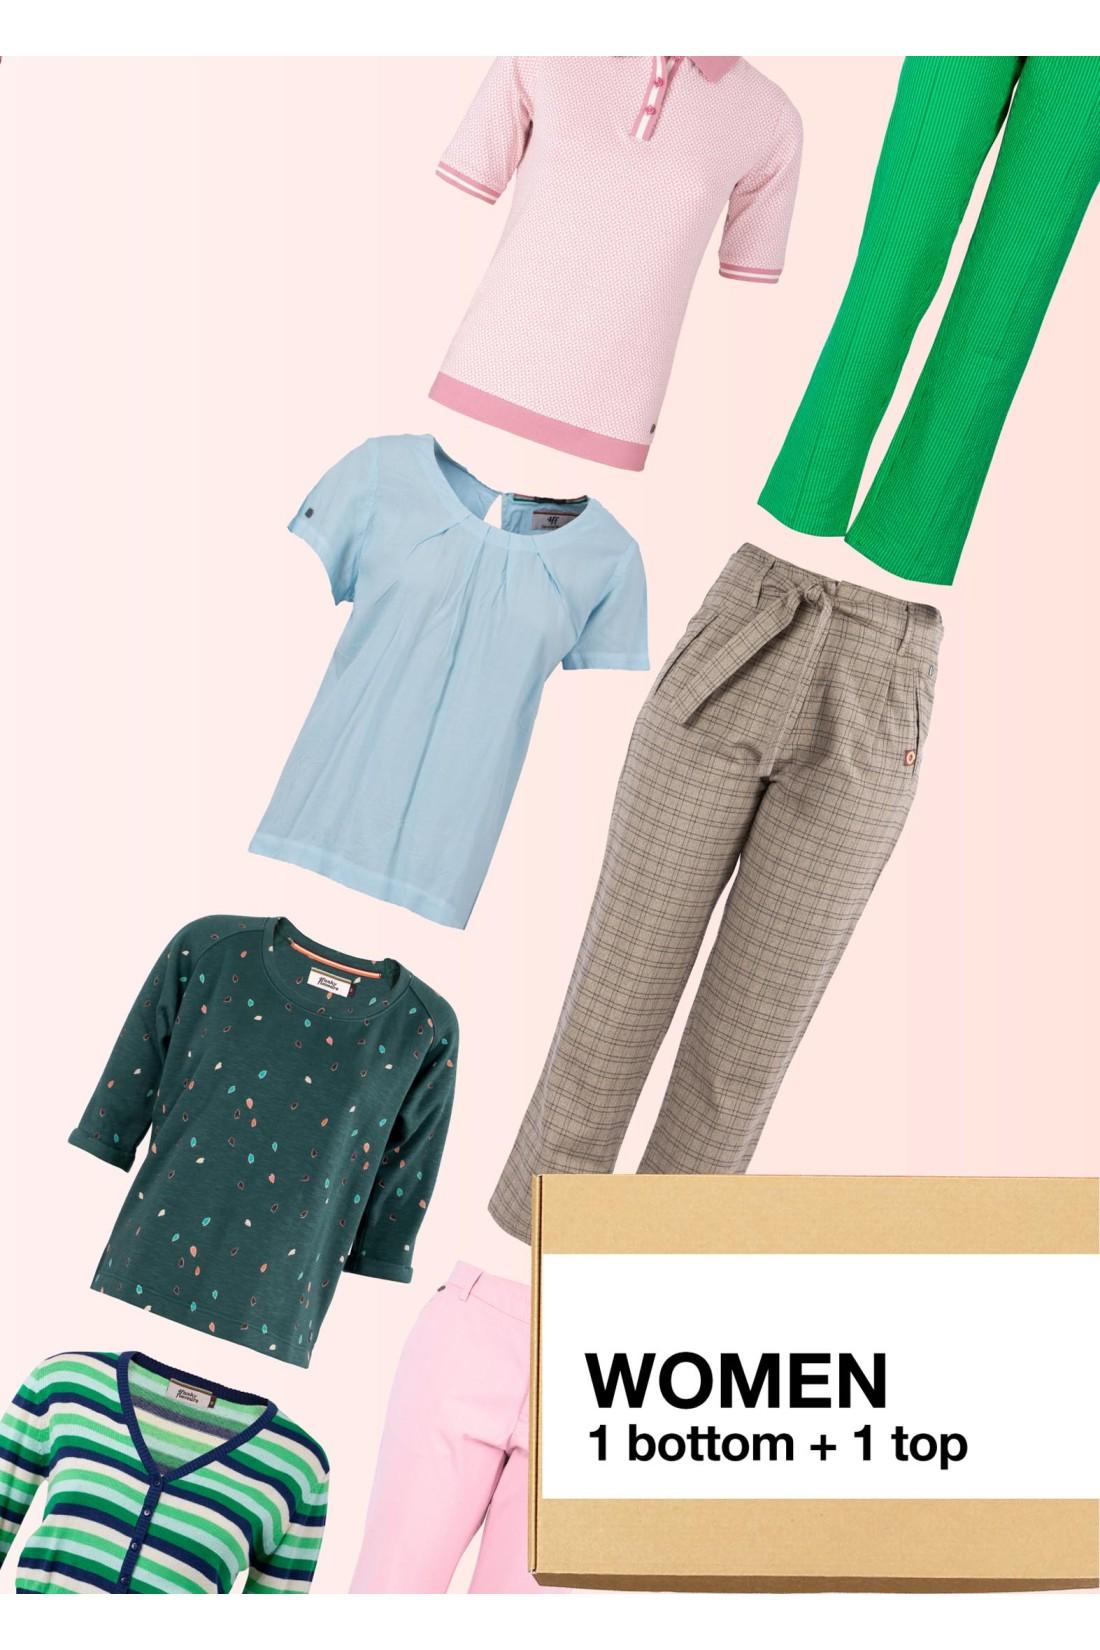 Surprise Box Women - Trouser Or Skirt + Top